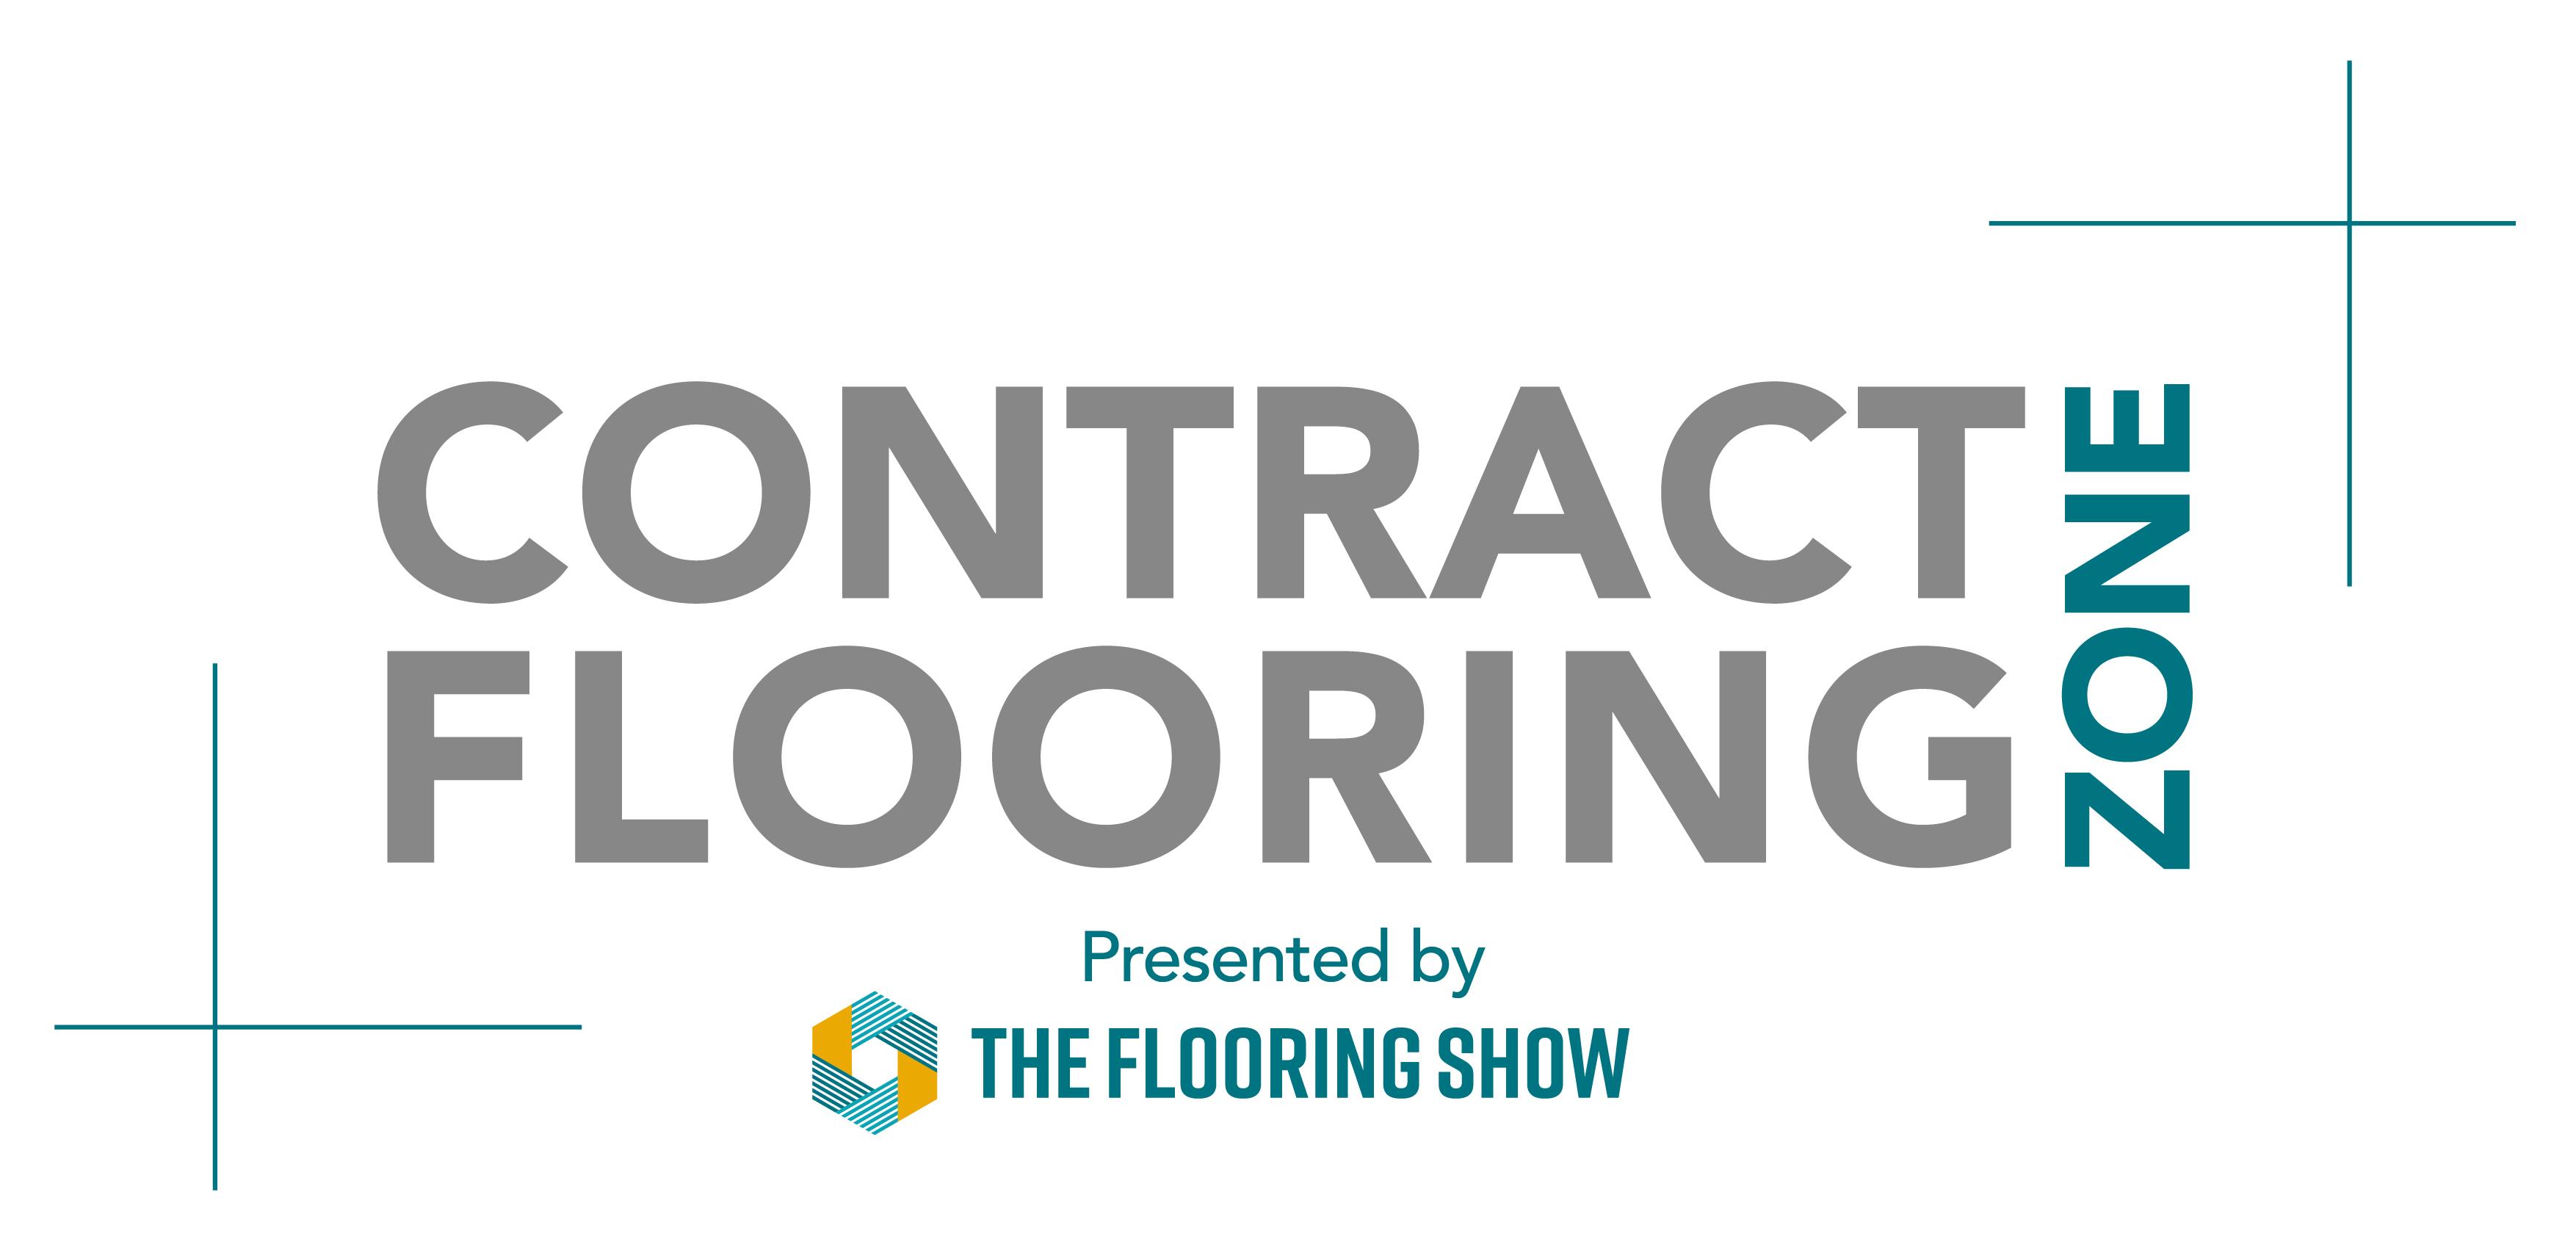 The Contract Flooring Zone